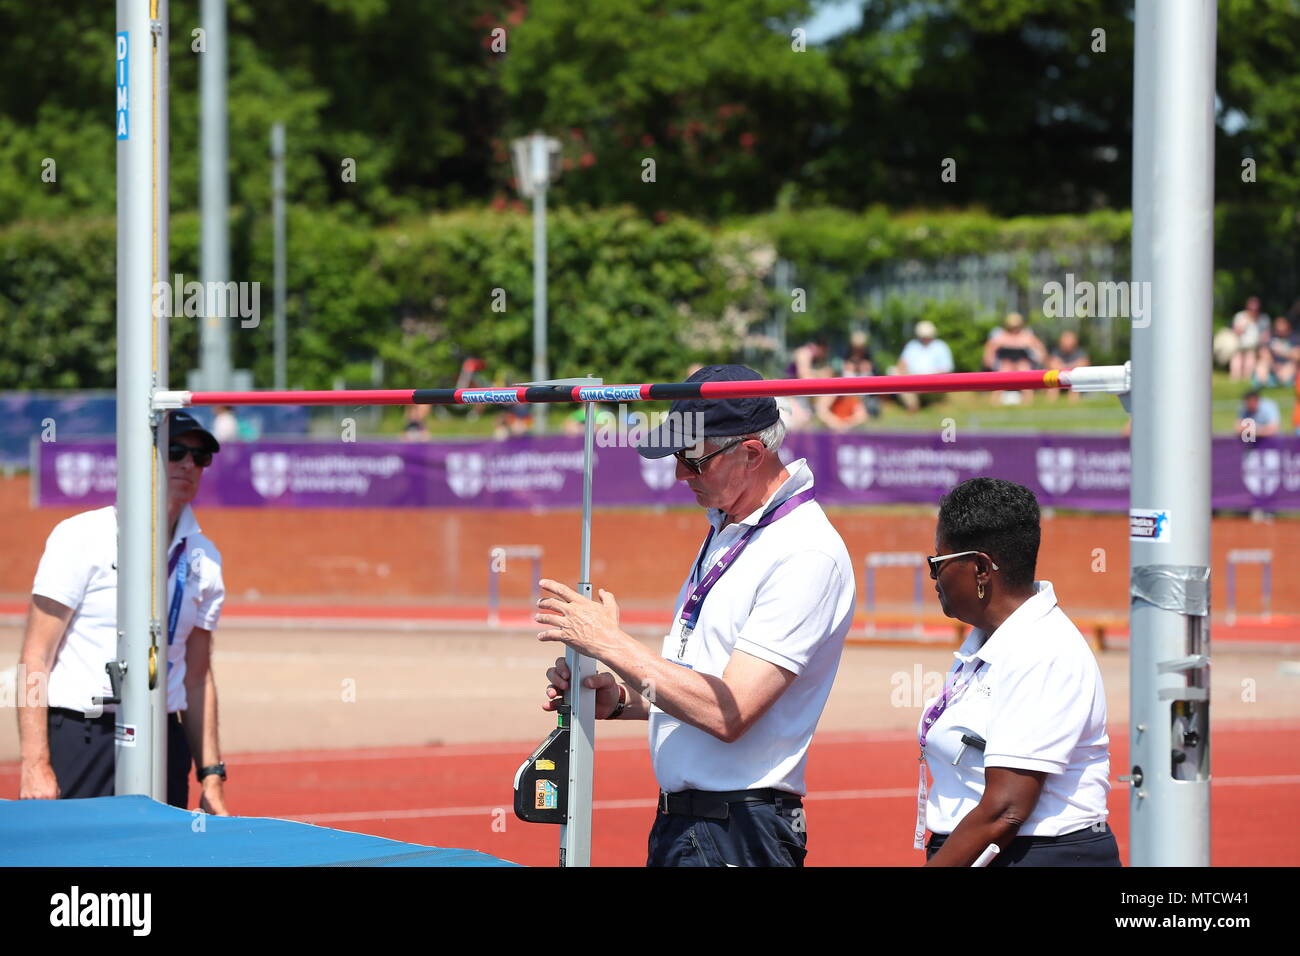 Loughborough, England, 20th, May, 2018.   Officials preparing the High Jump apparatus at the LIA2018 Loughborough International Athletics meeting.     - Stock Image